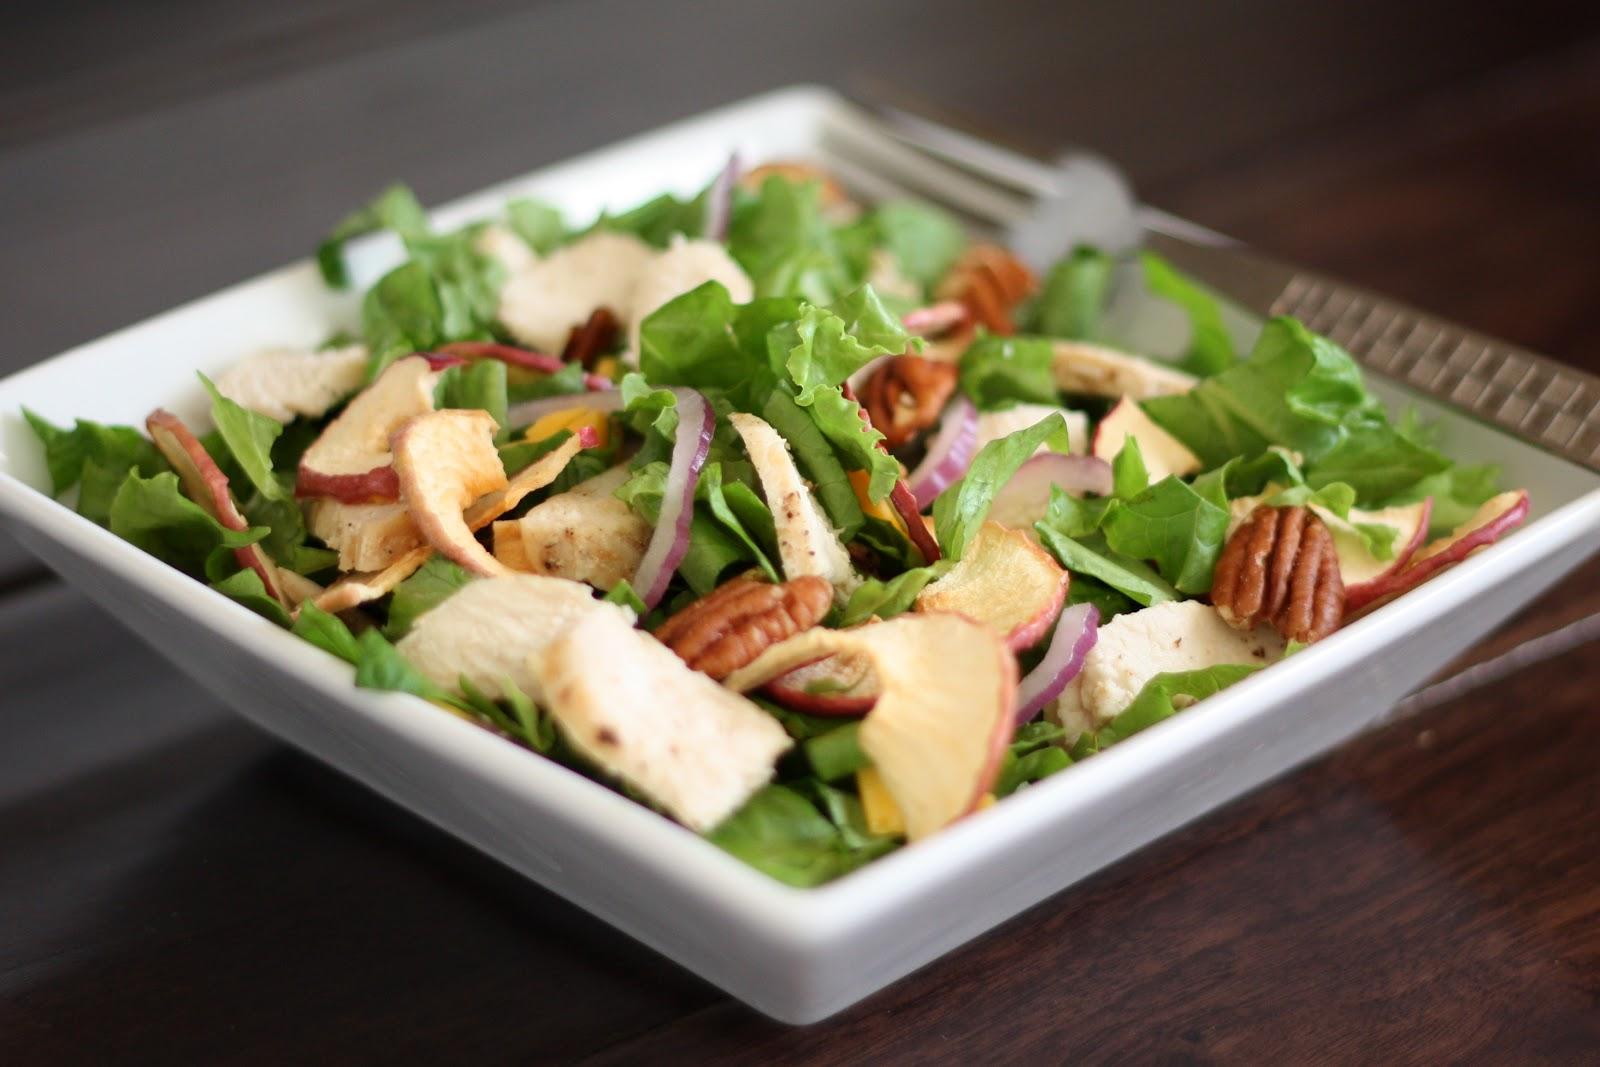 Barefeet In The Kitchen: Fuji Apple Chicken Salad